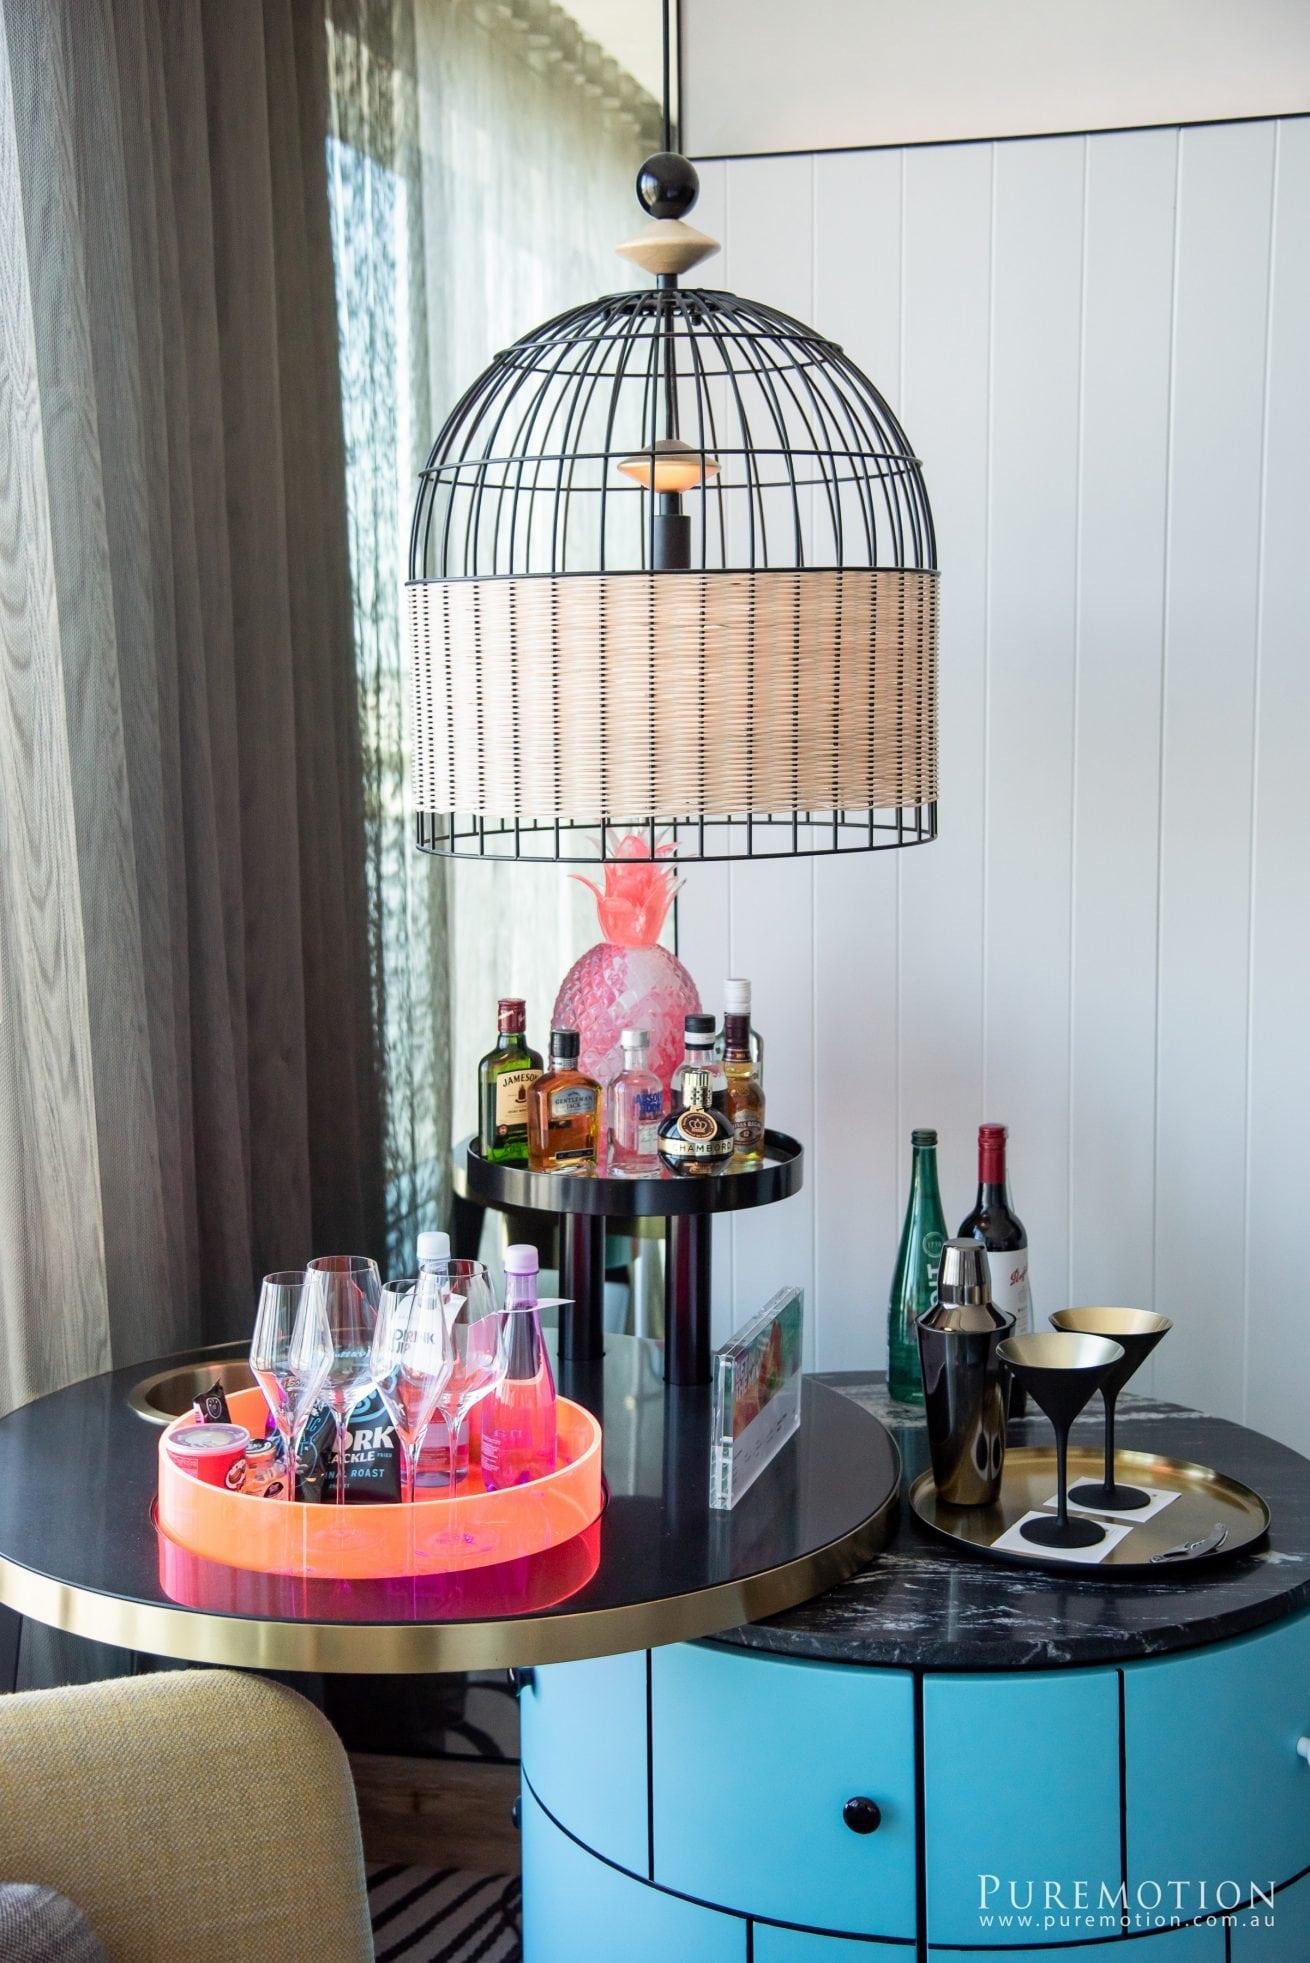 Puremotion Wedding Photography Alex Huang Brisbane W Hotel041